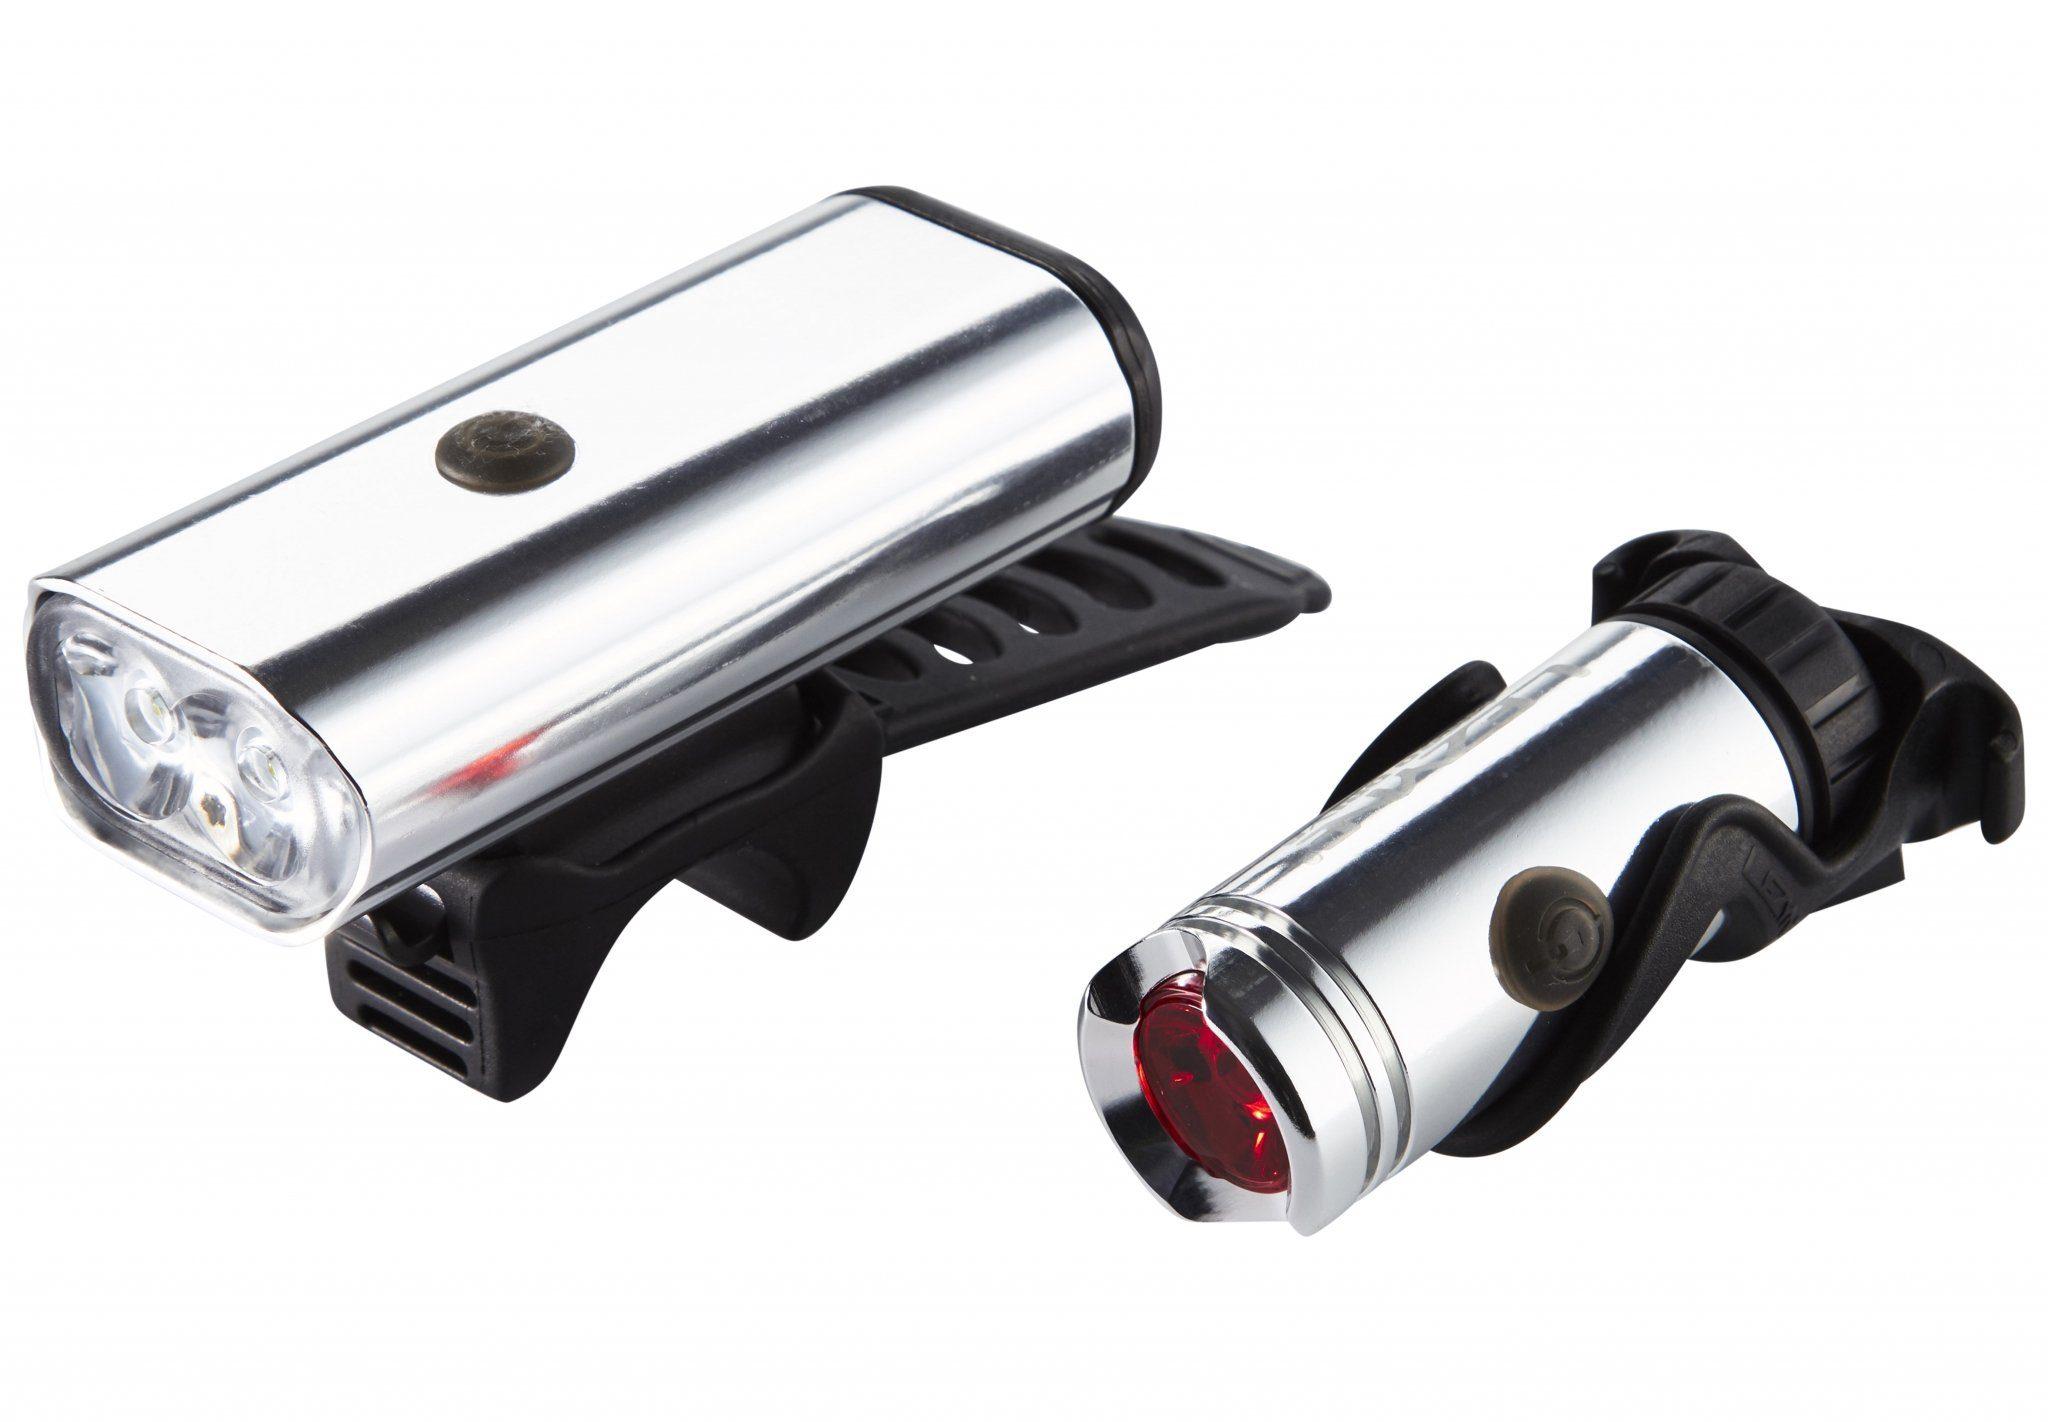 Lezyne Fahrradbeleuchtung »Macro Drive 600 XL / LED Micro Drive«